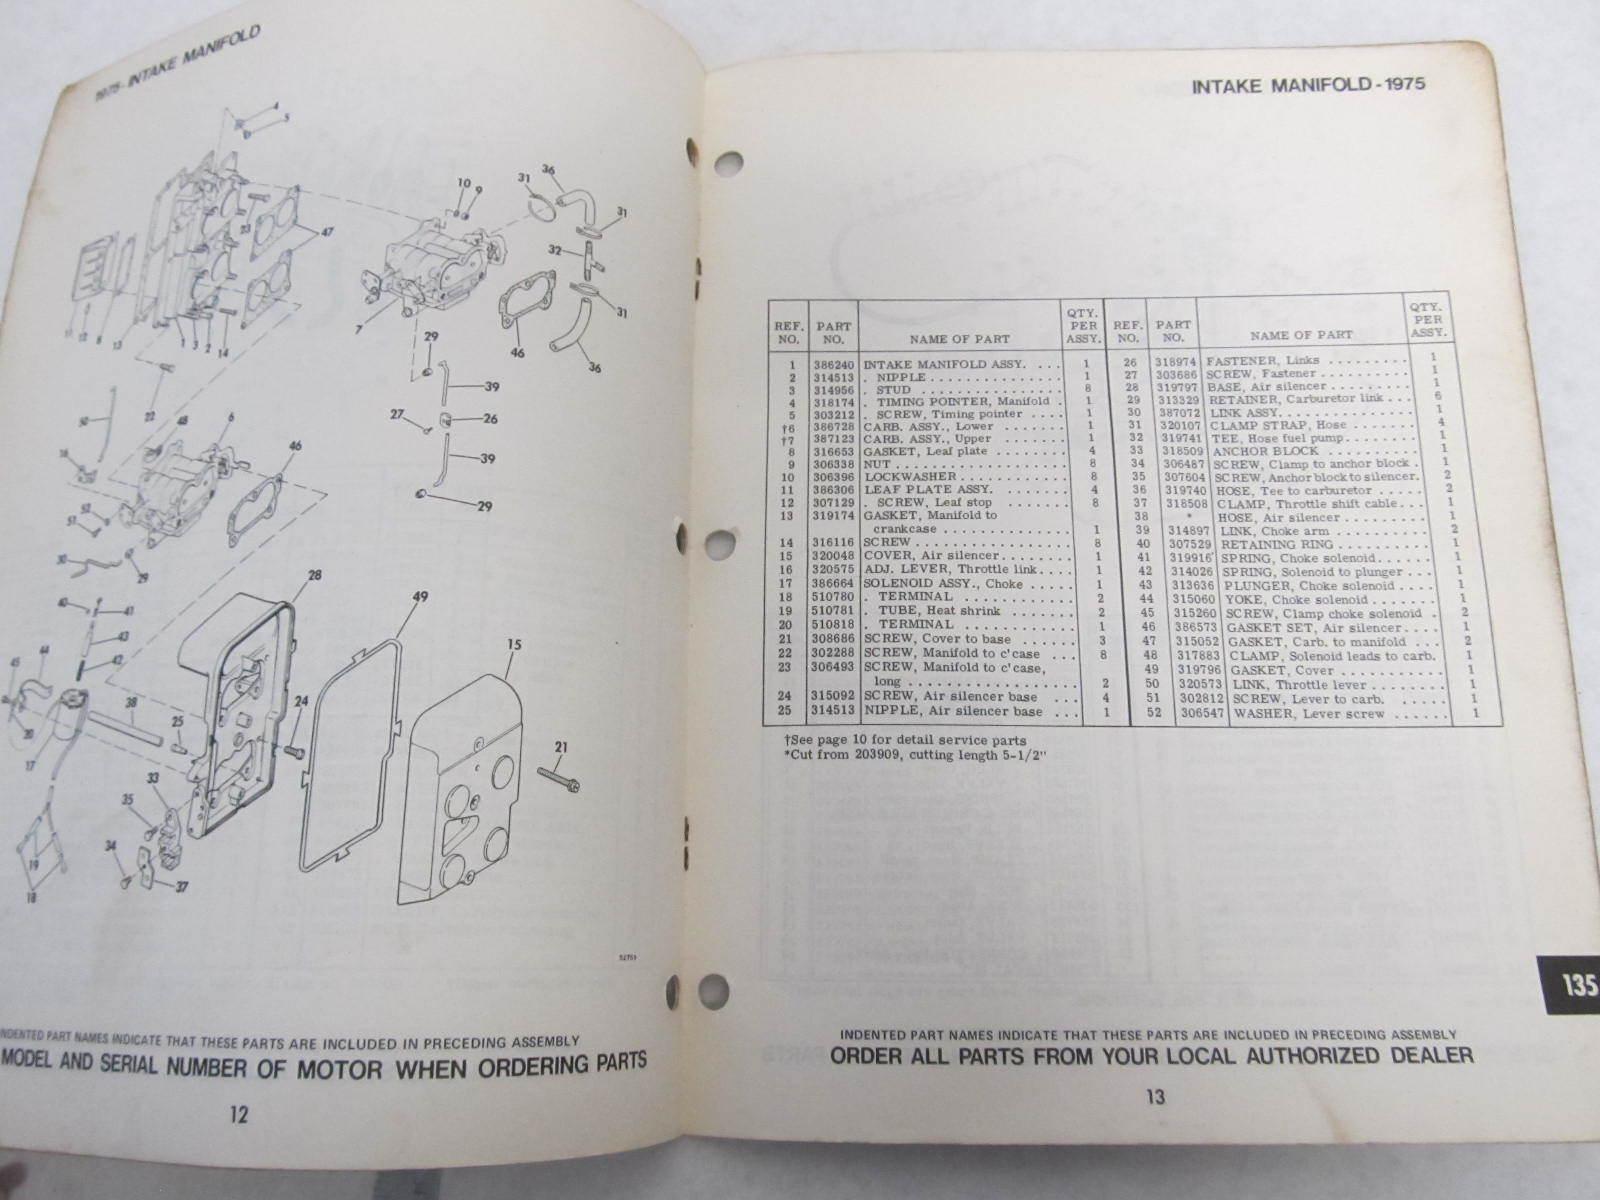 15 Hp Evinrude Parts Diagram - All Diagram Schematics